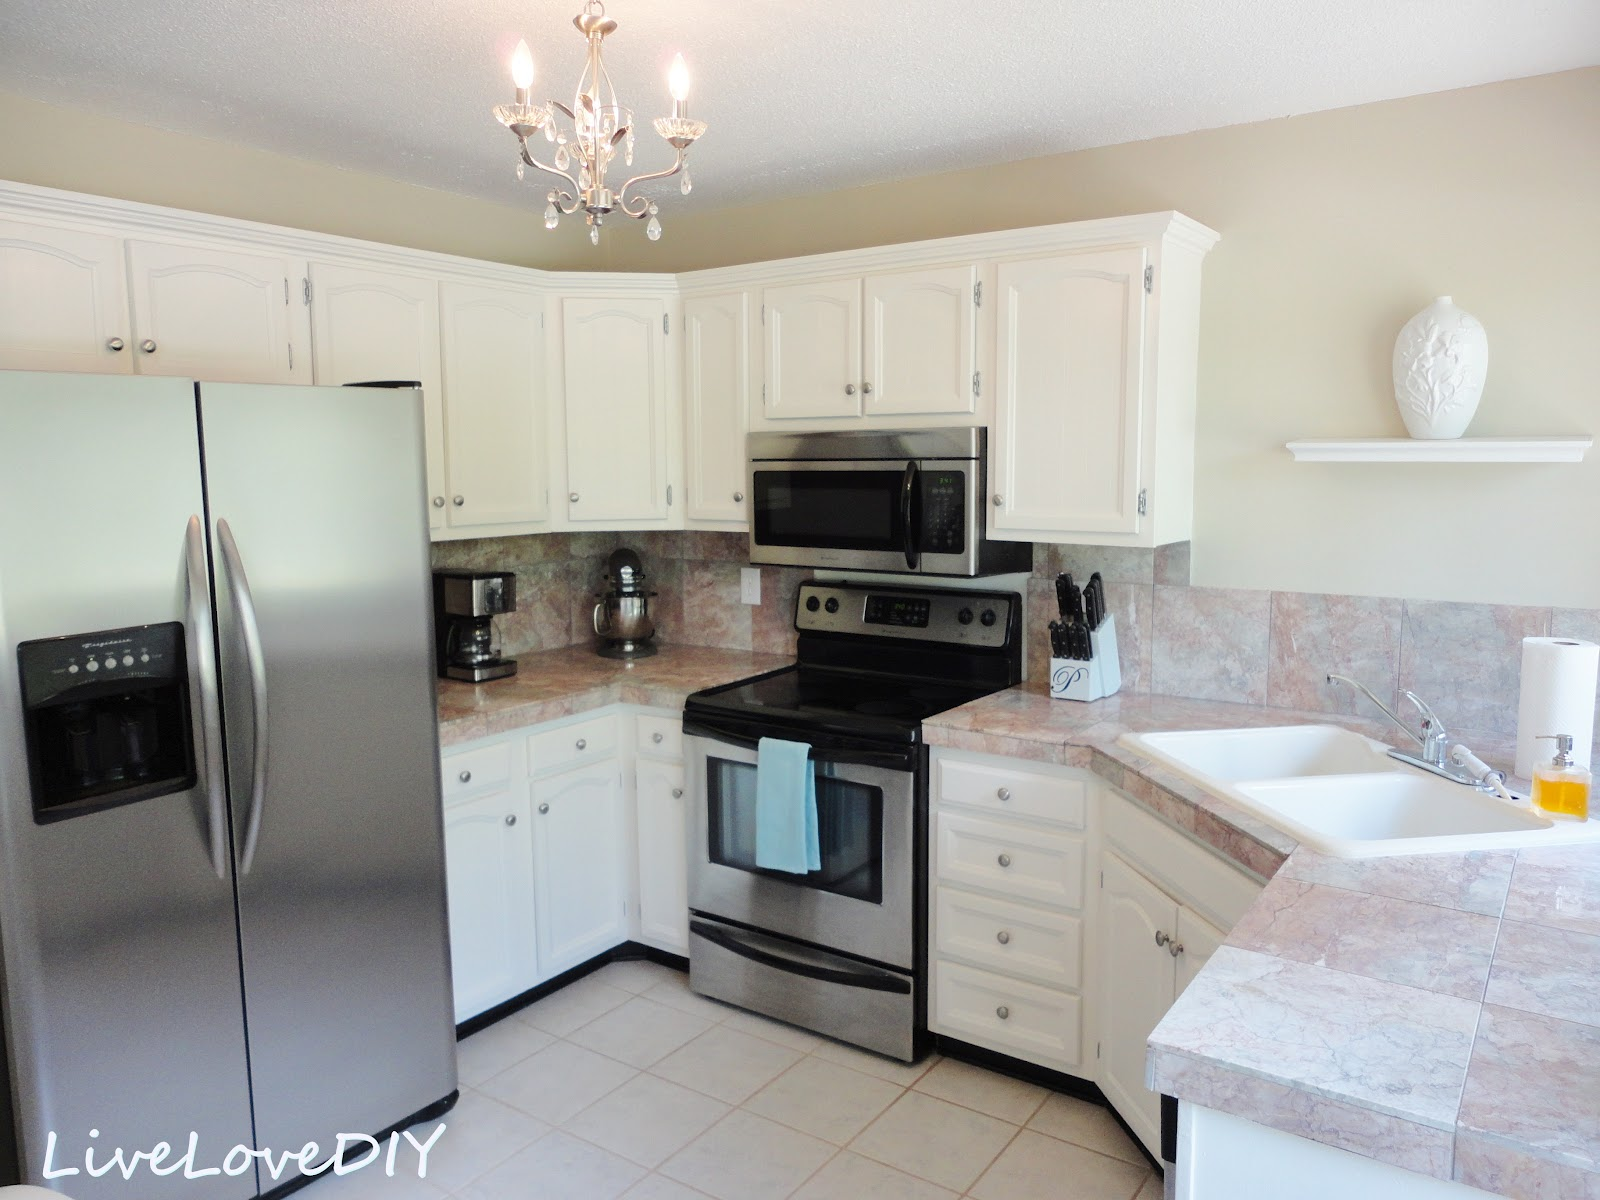 Kitchen Cabinet Chalk Paint Makeover | Creative Home